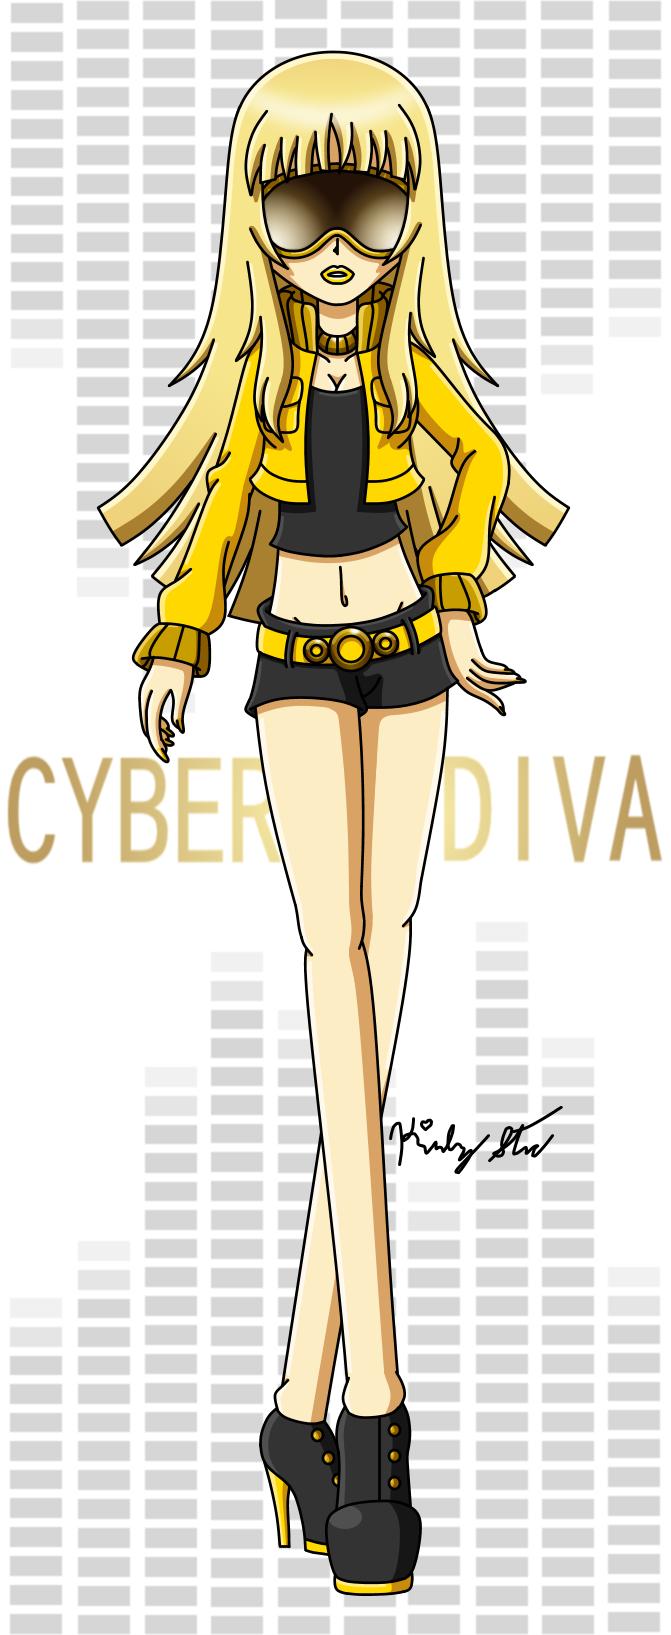 Vocaloid cyber diva by drinkyourvegetable on deviantart - Cyber diva vocaloid ...